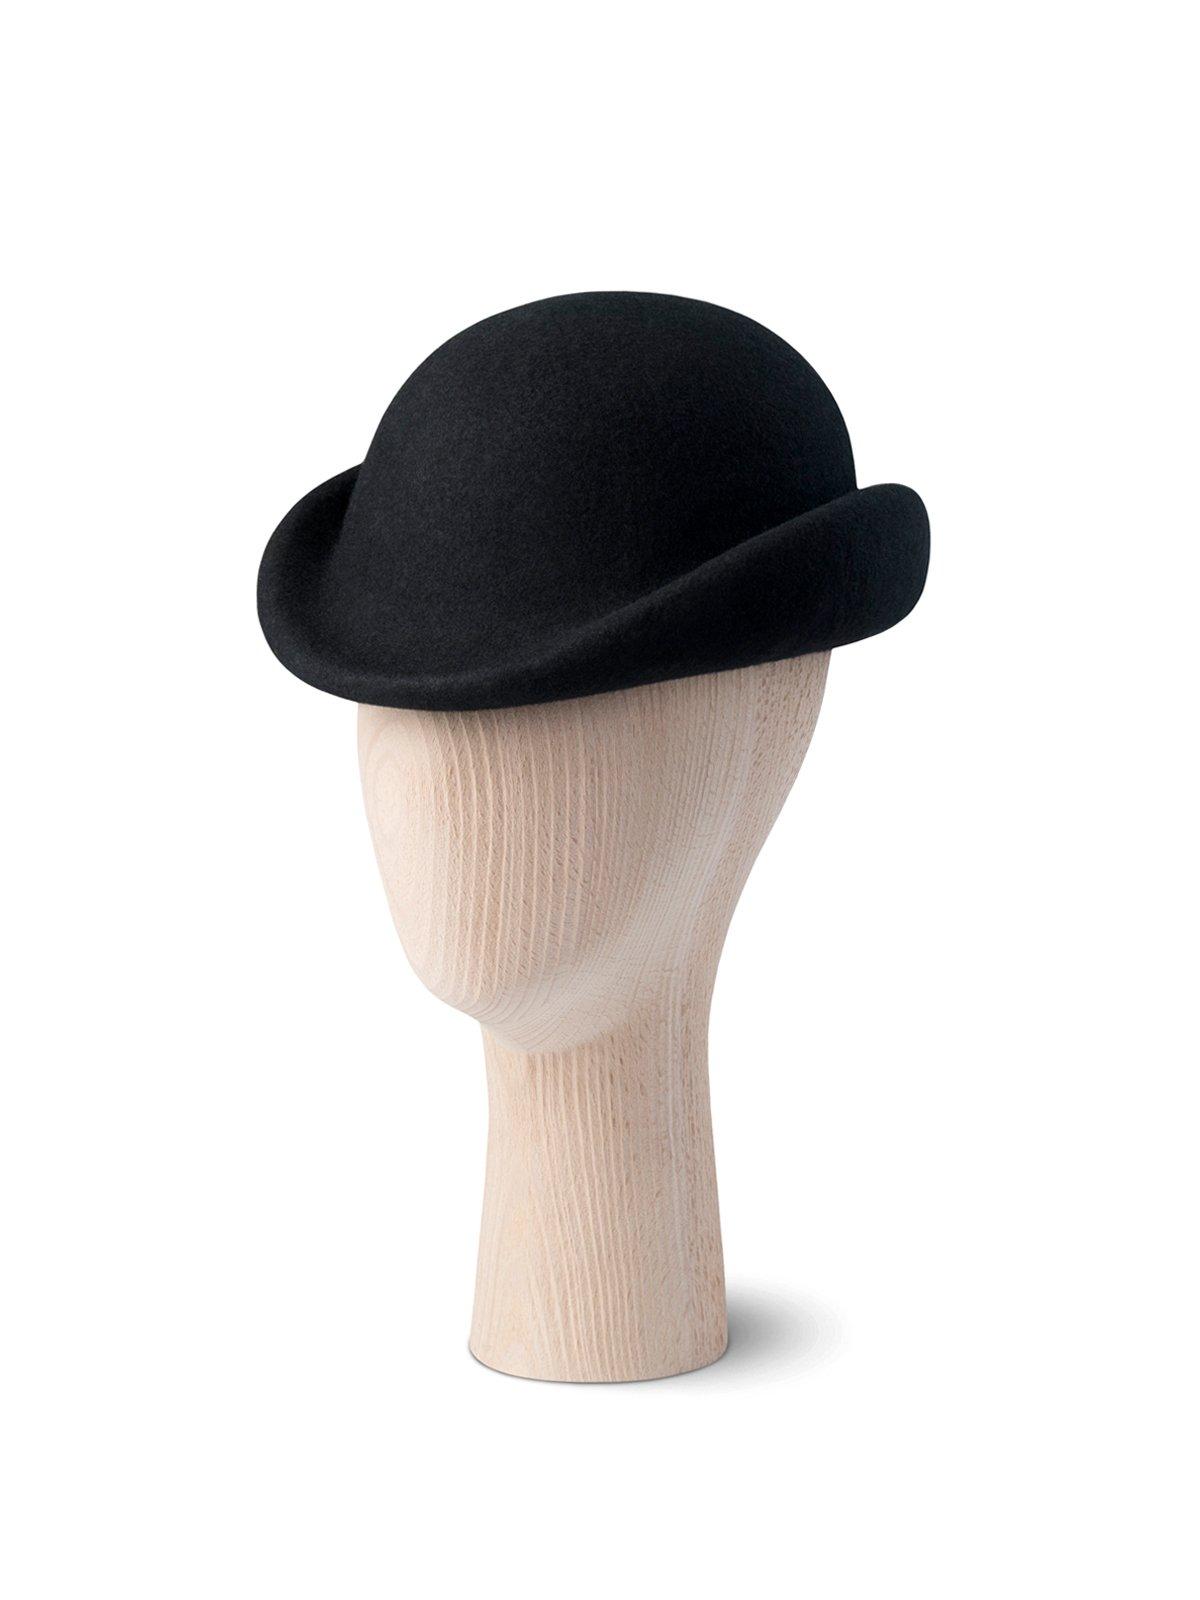 Midi Bowler Hat